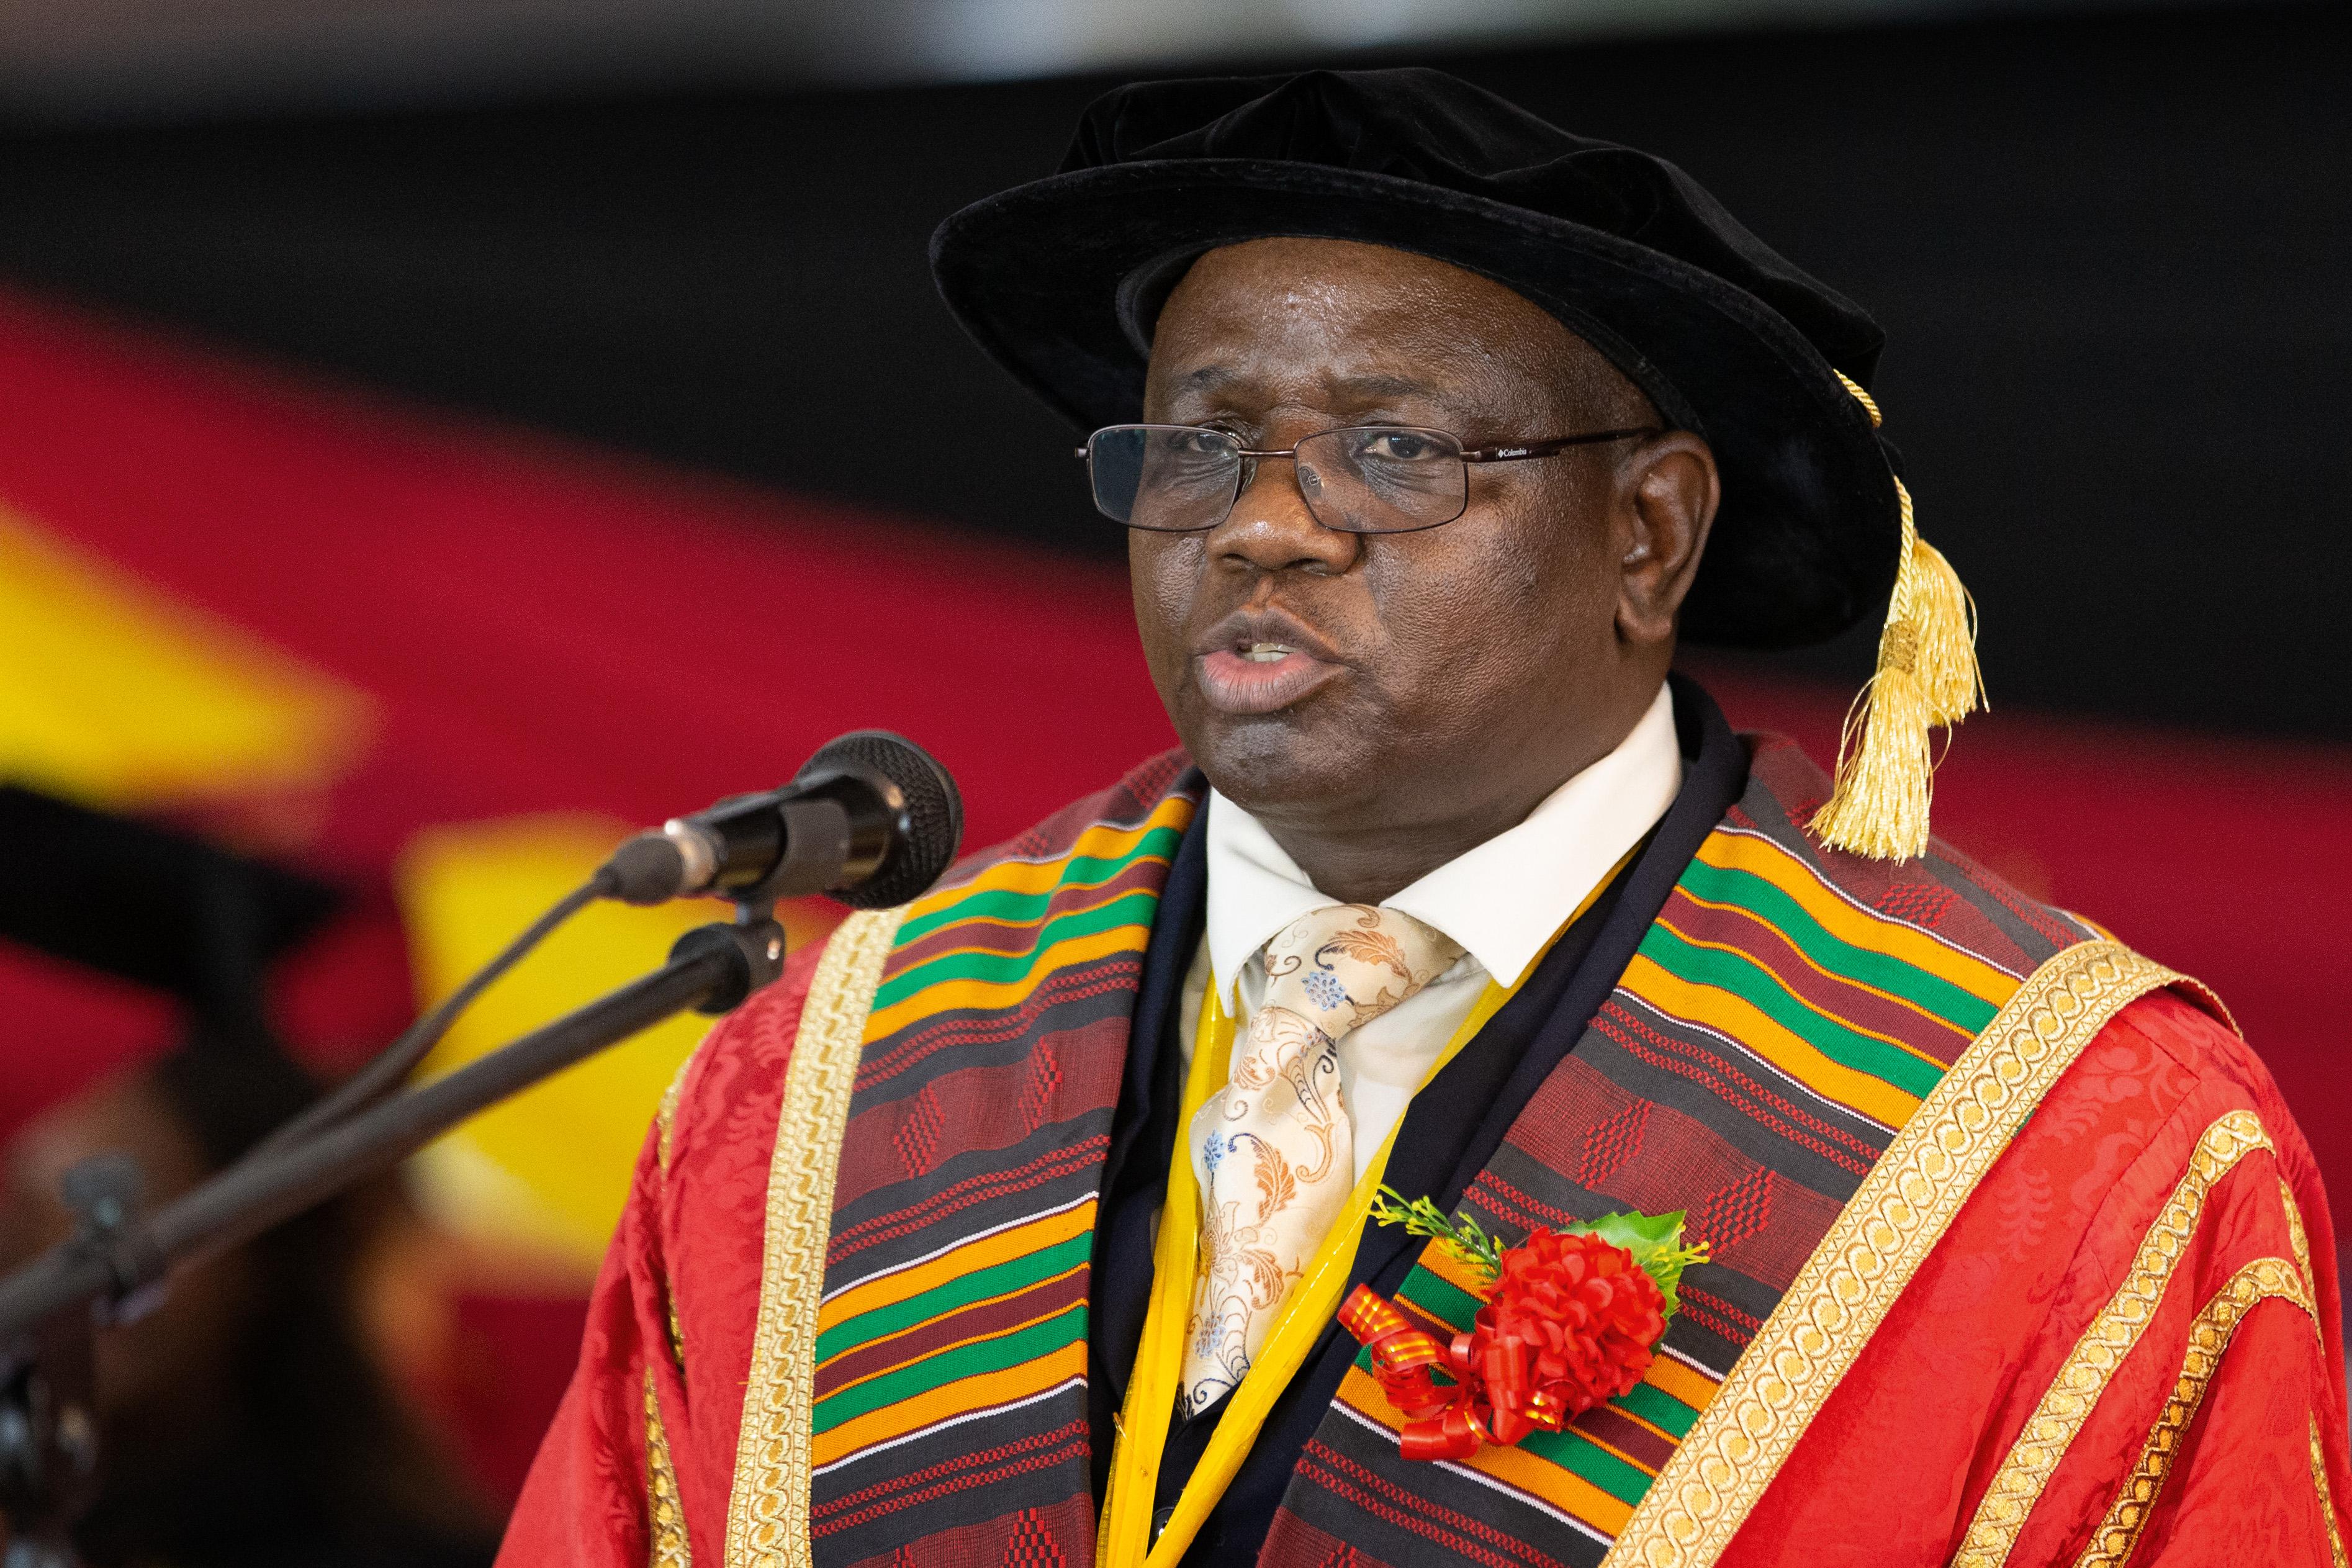 Munashe Furusa, vice chancellor of Africa University. Photo by Kathleen Barry, United Methodist Communications.